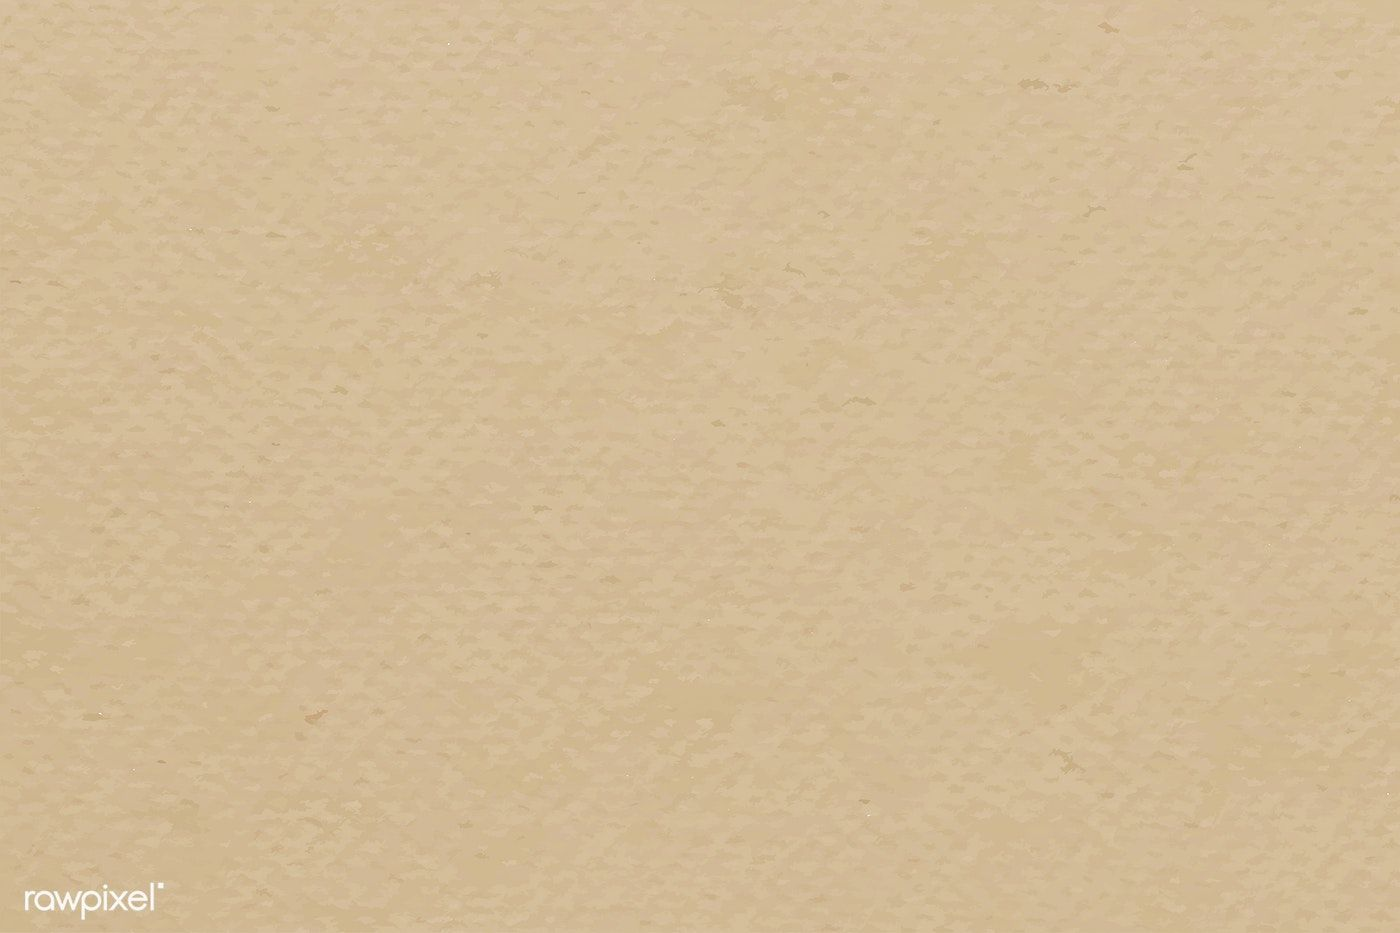 Plain Beige Canvas Paper Textured Background Vector Free Image